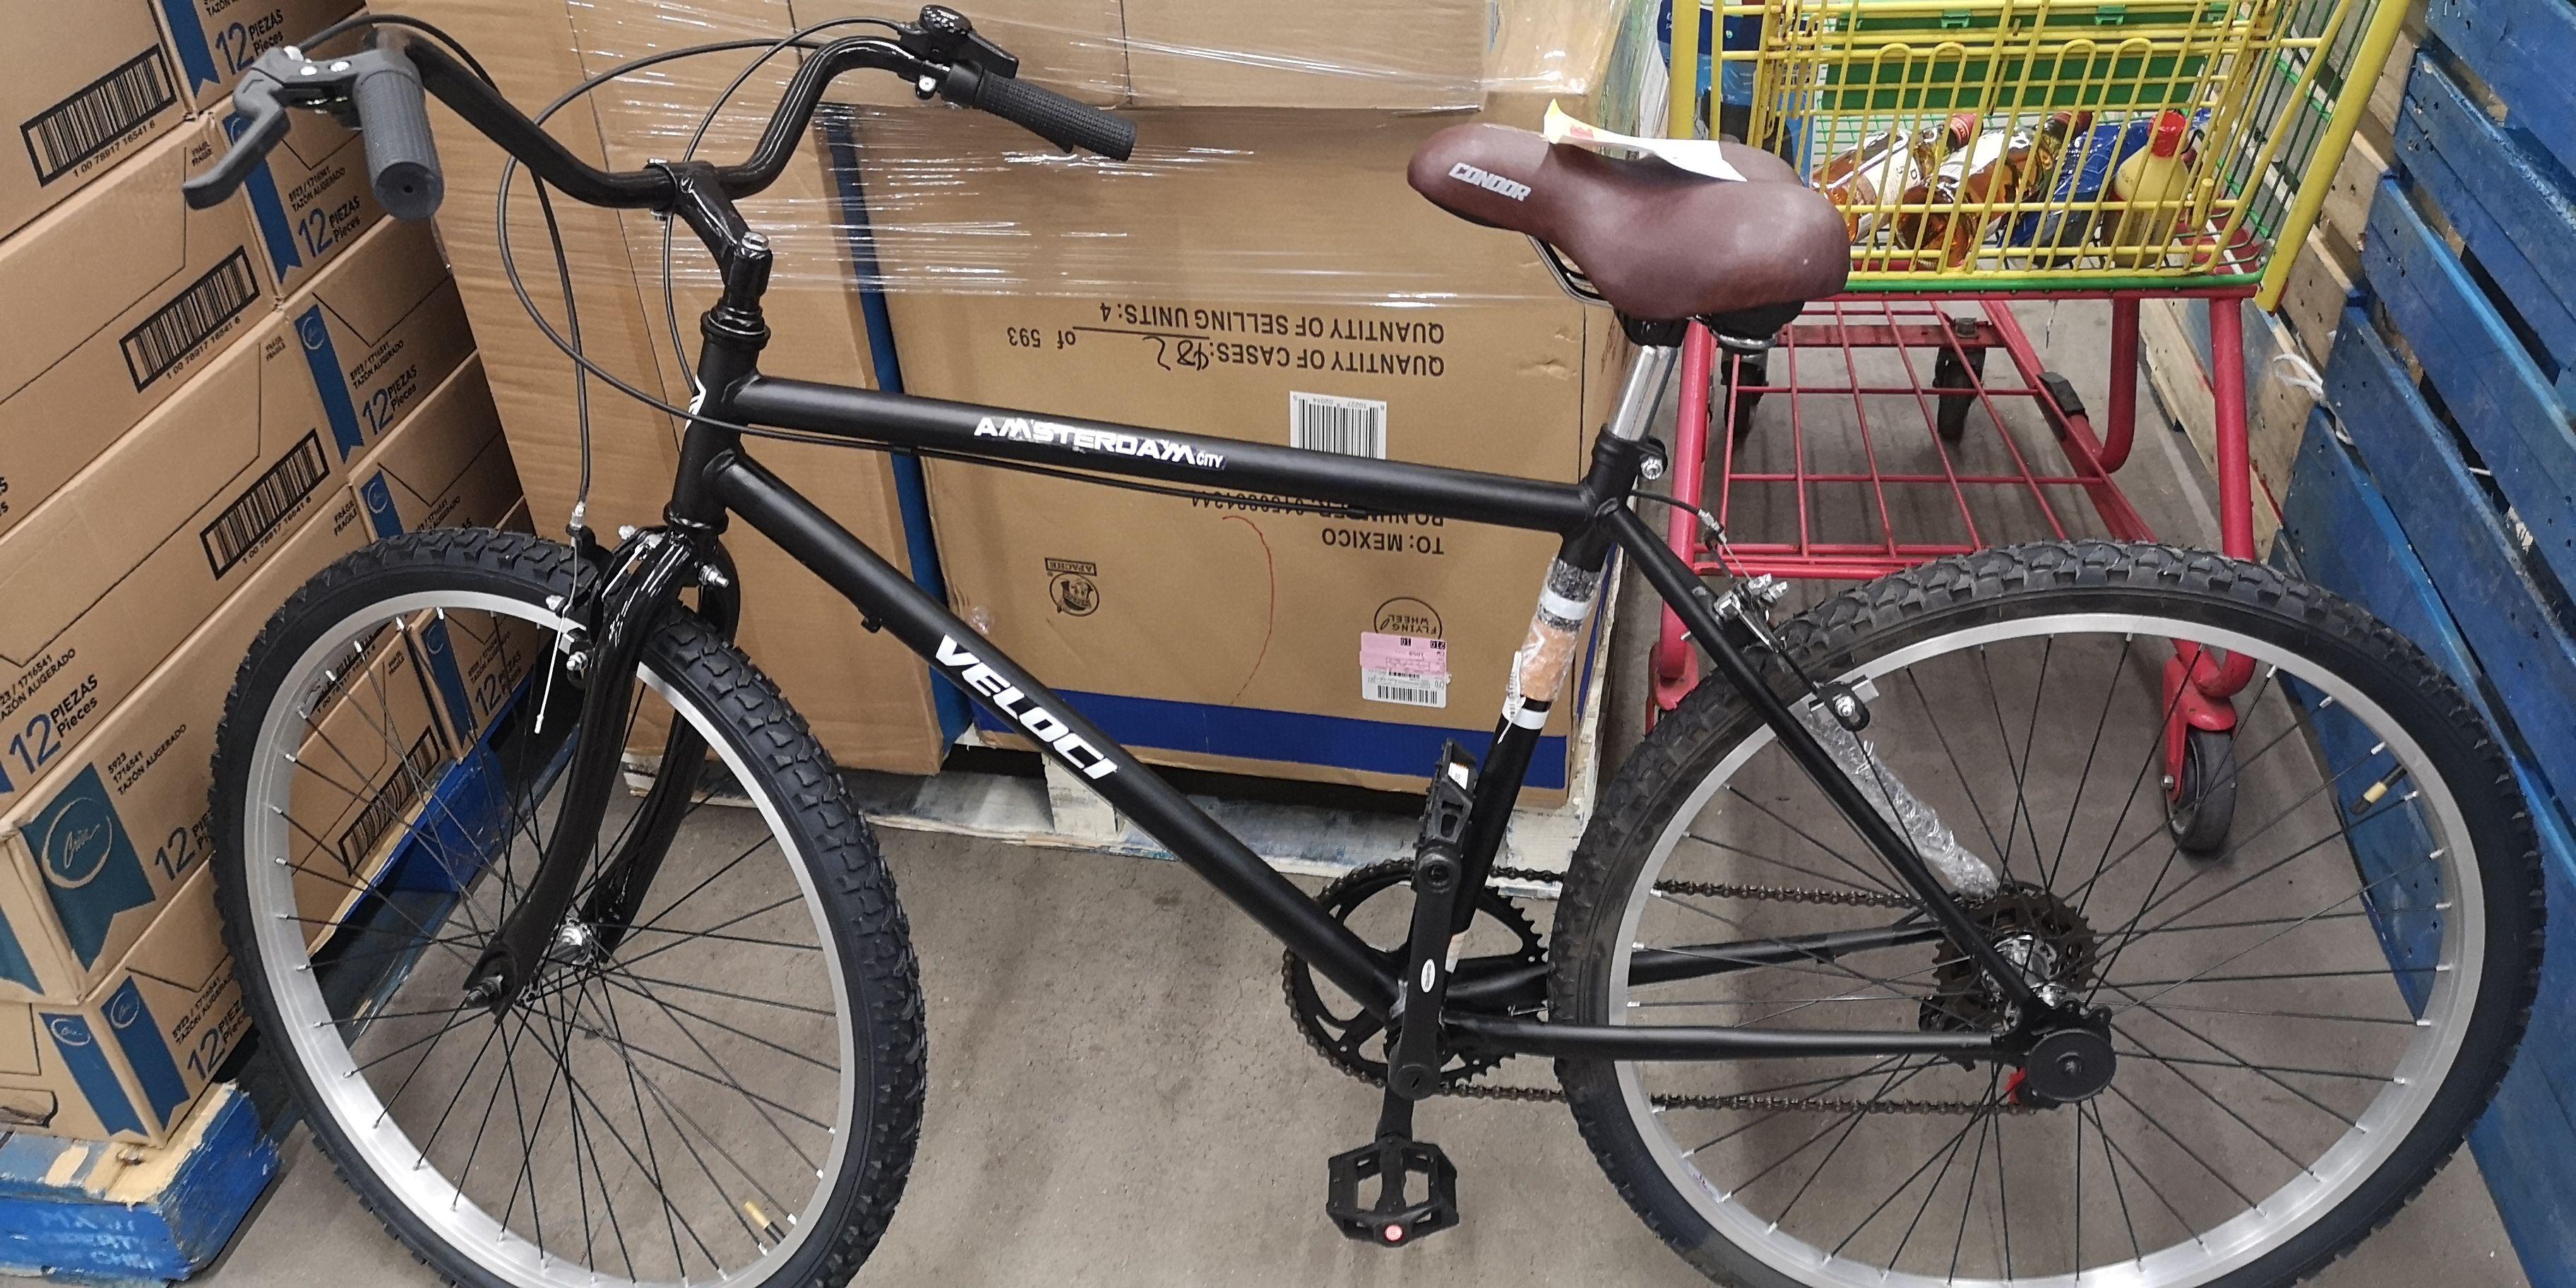 Bodega Aurrera bicicleta Ámsterdam rin 26 $999.02